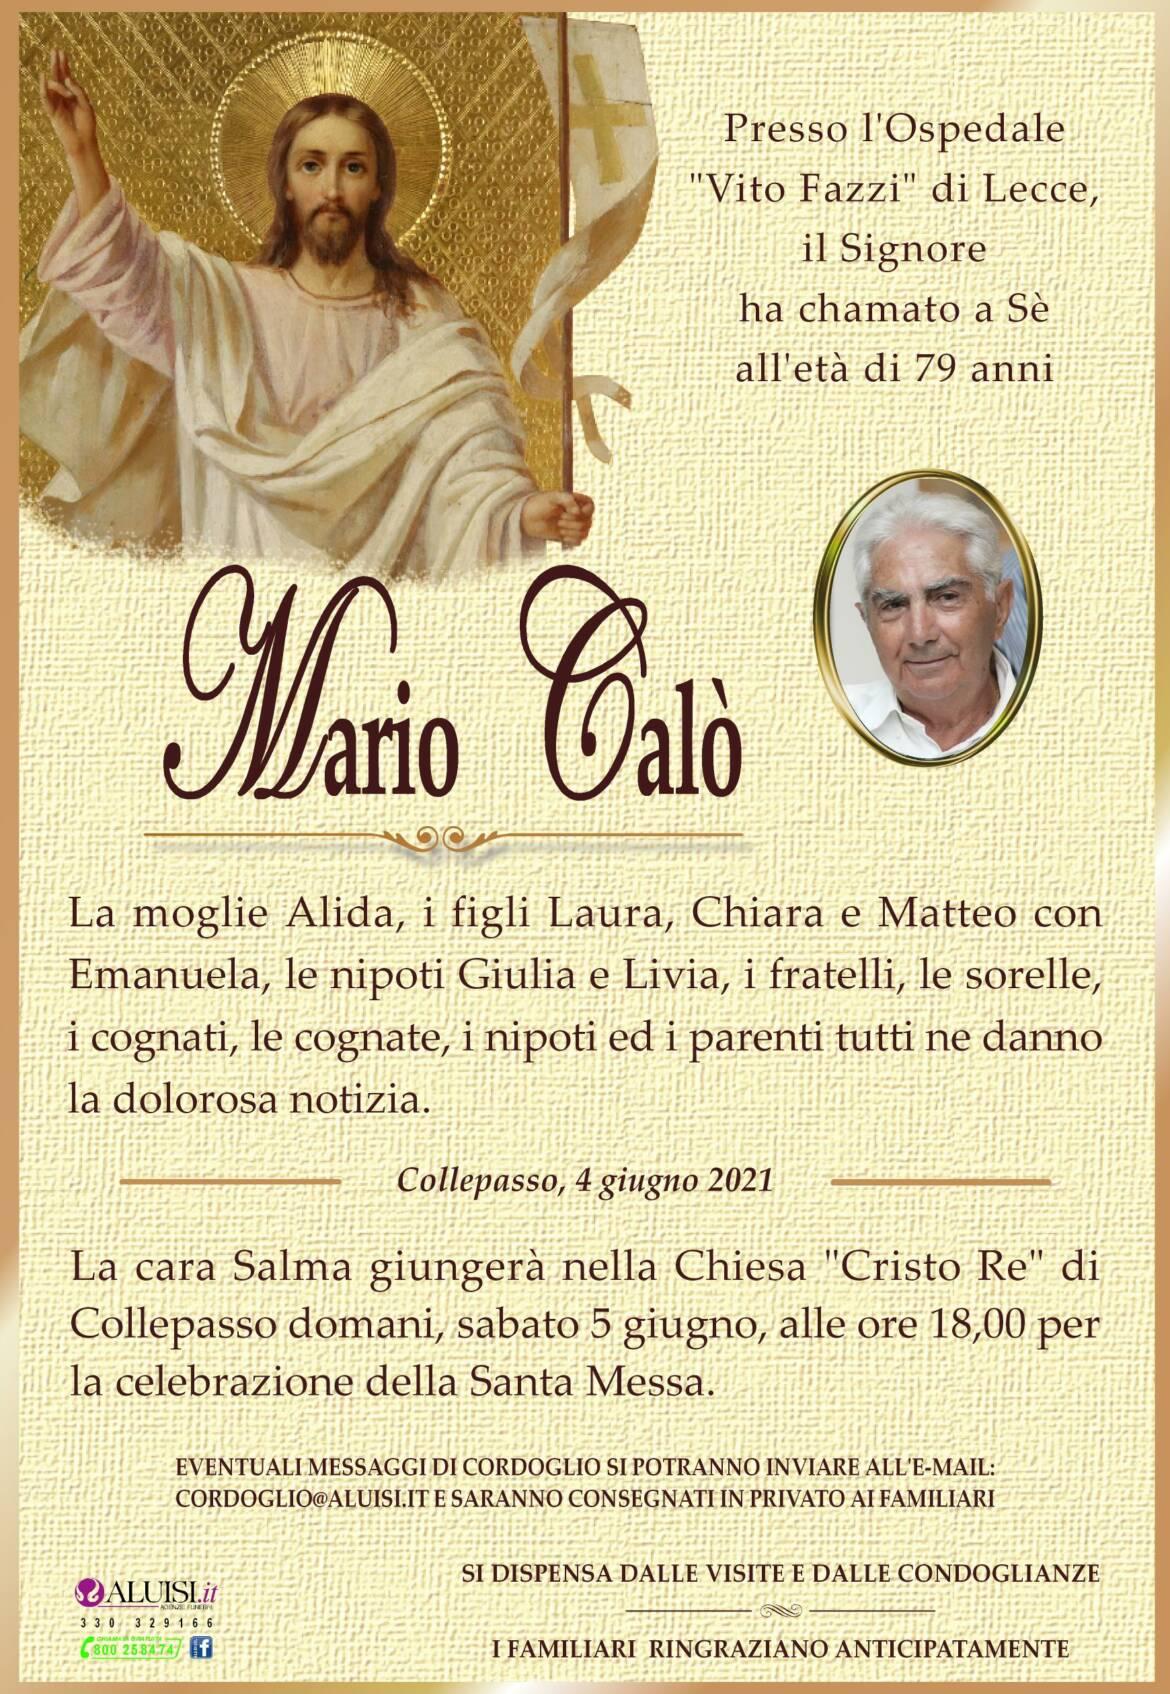 Annuncio-MARIO-CALo-COLLEPASSO.jpg